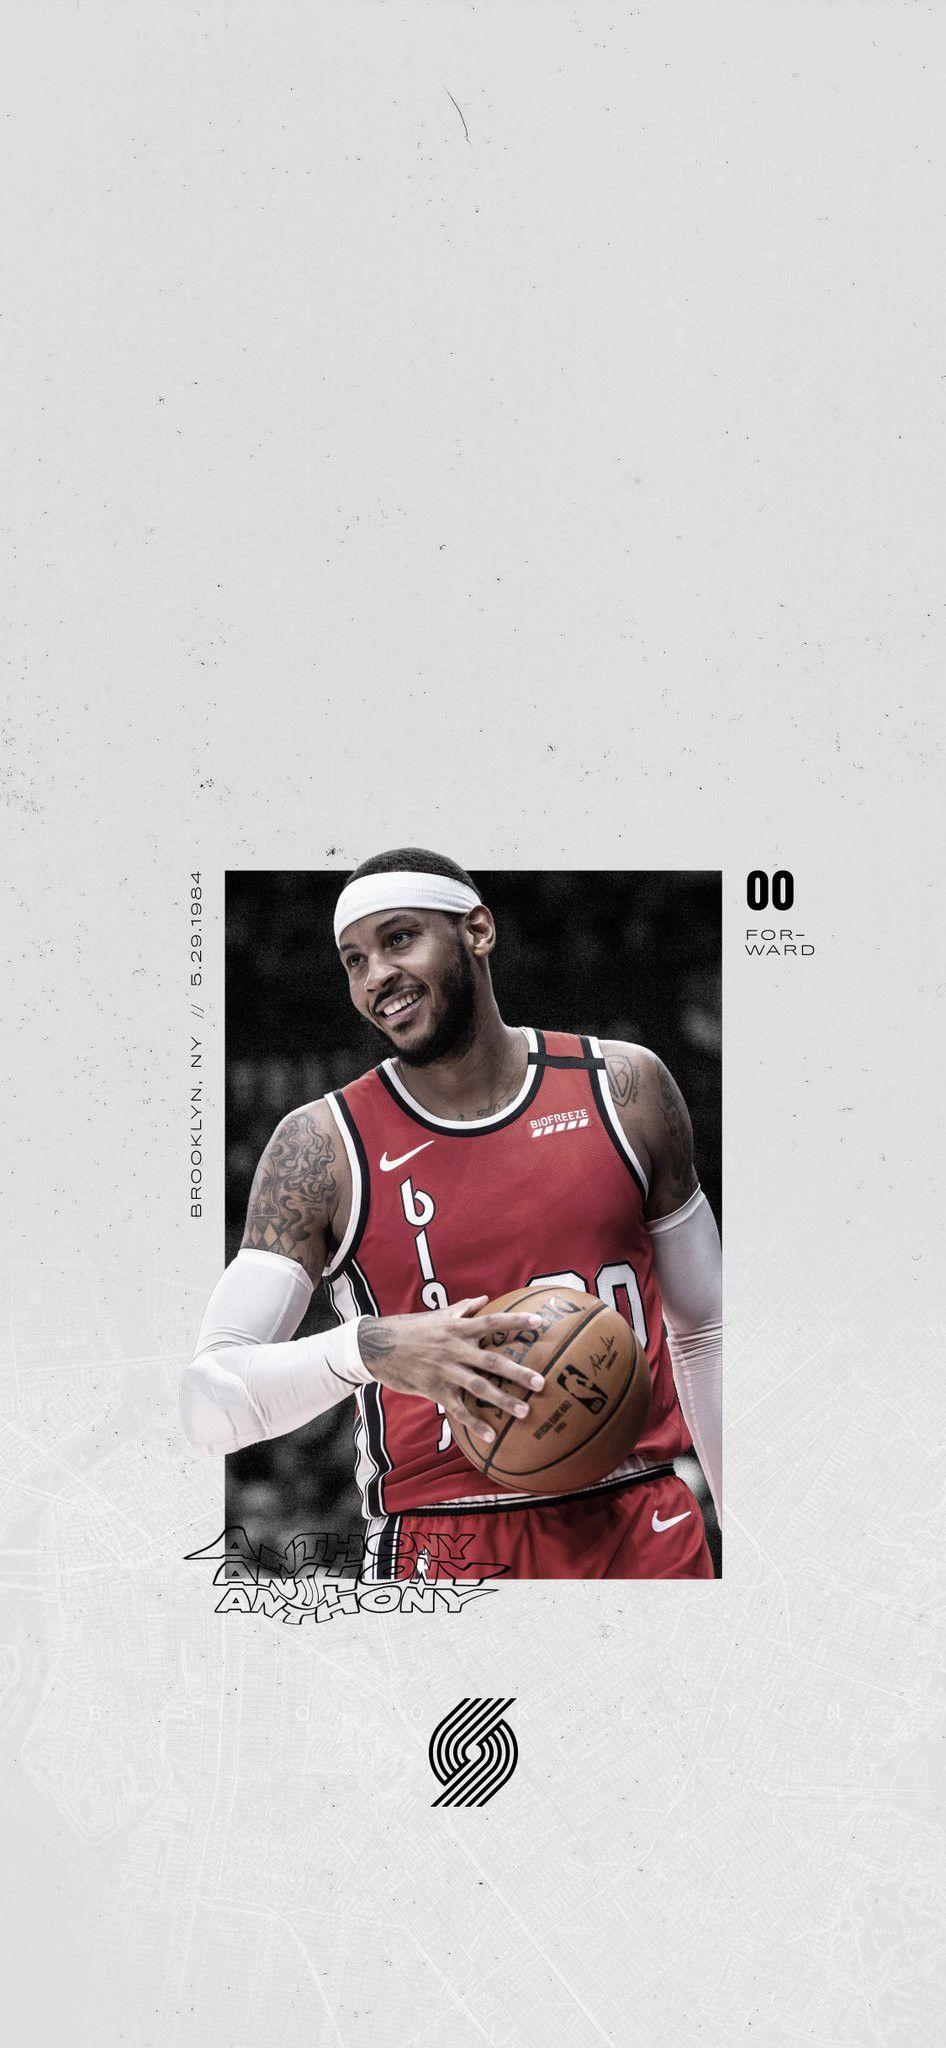 Carmelo Anthony Wallpaper Carmelo Anthony Wallpaper Carmelo Anthony Best Nba Players